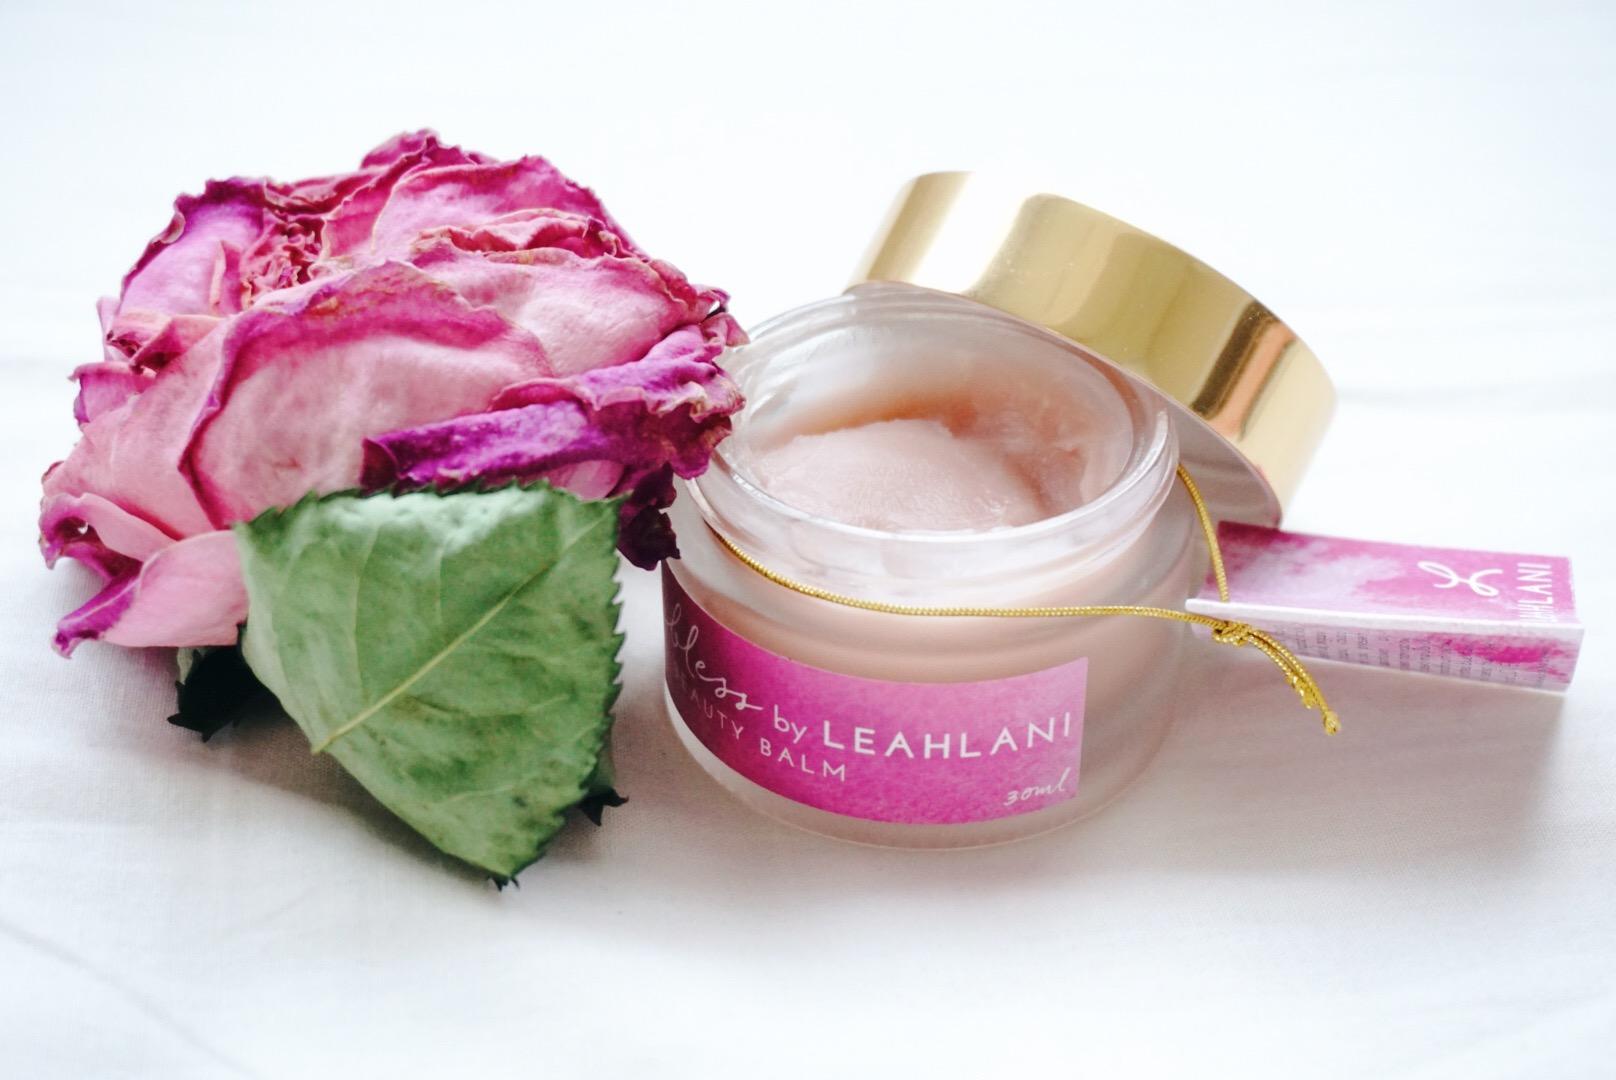 Leahlani Bless Beauty Balm Review